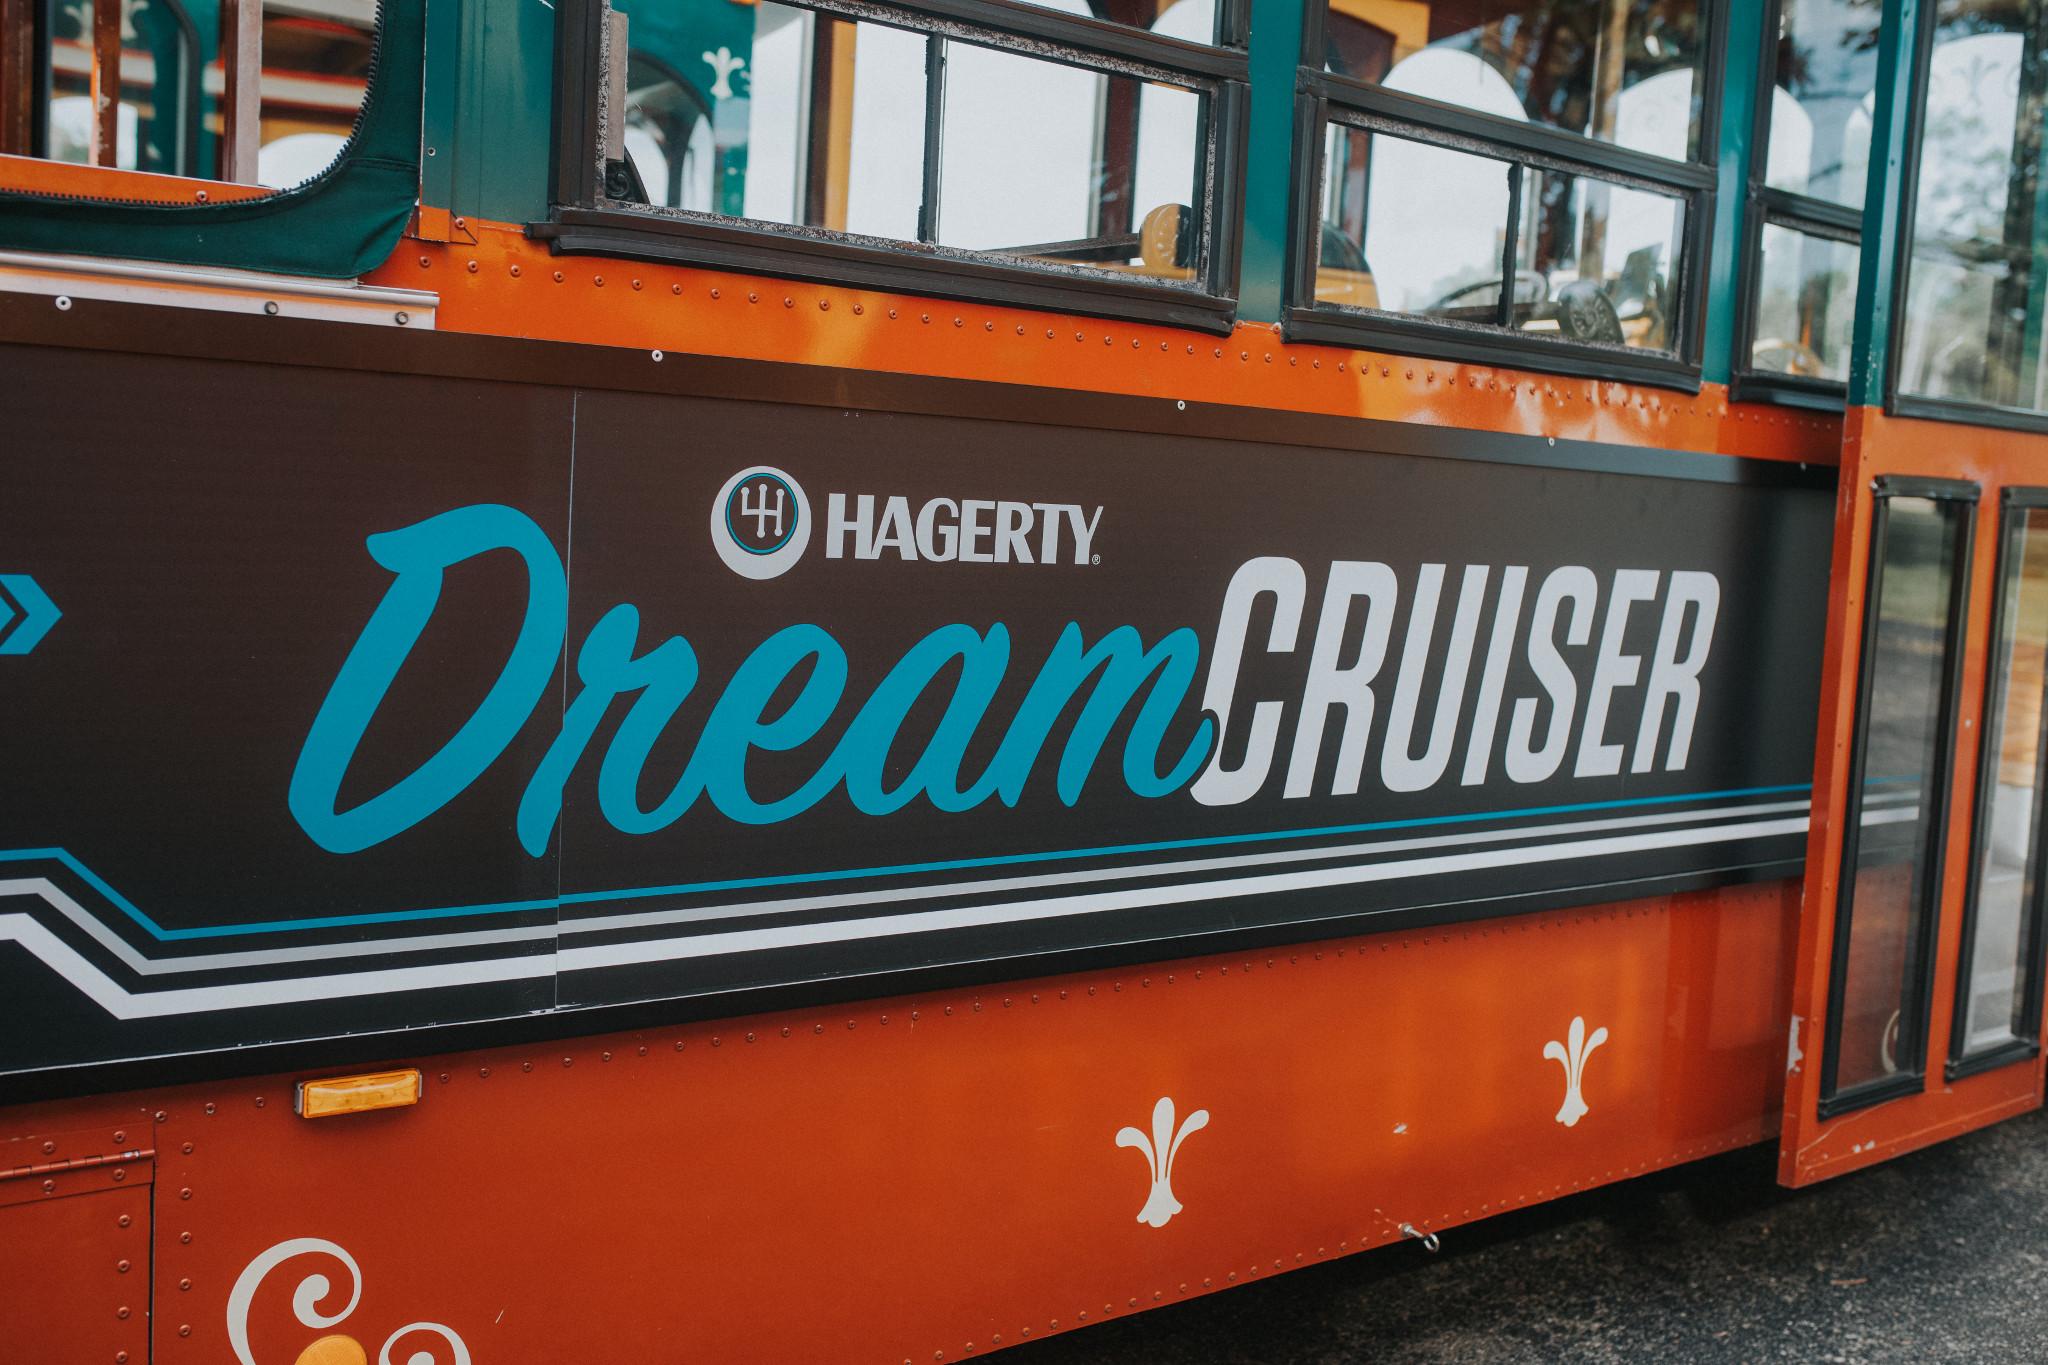 Hagerty Dream cruiser woodward dream cruise